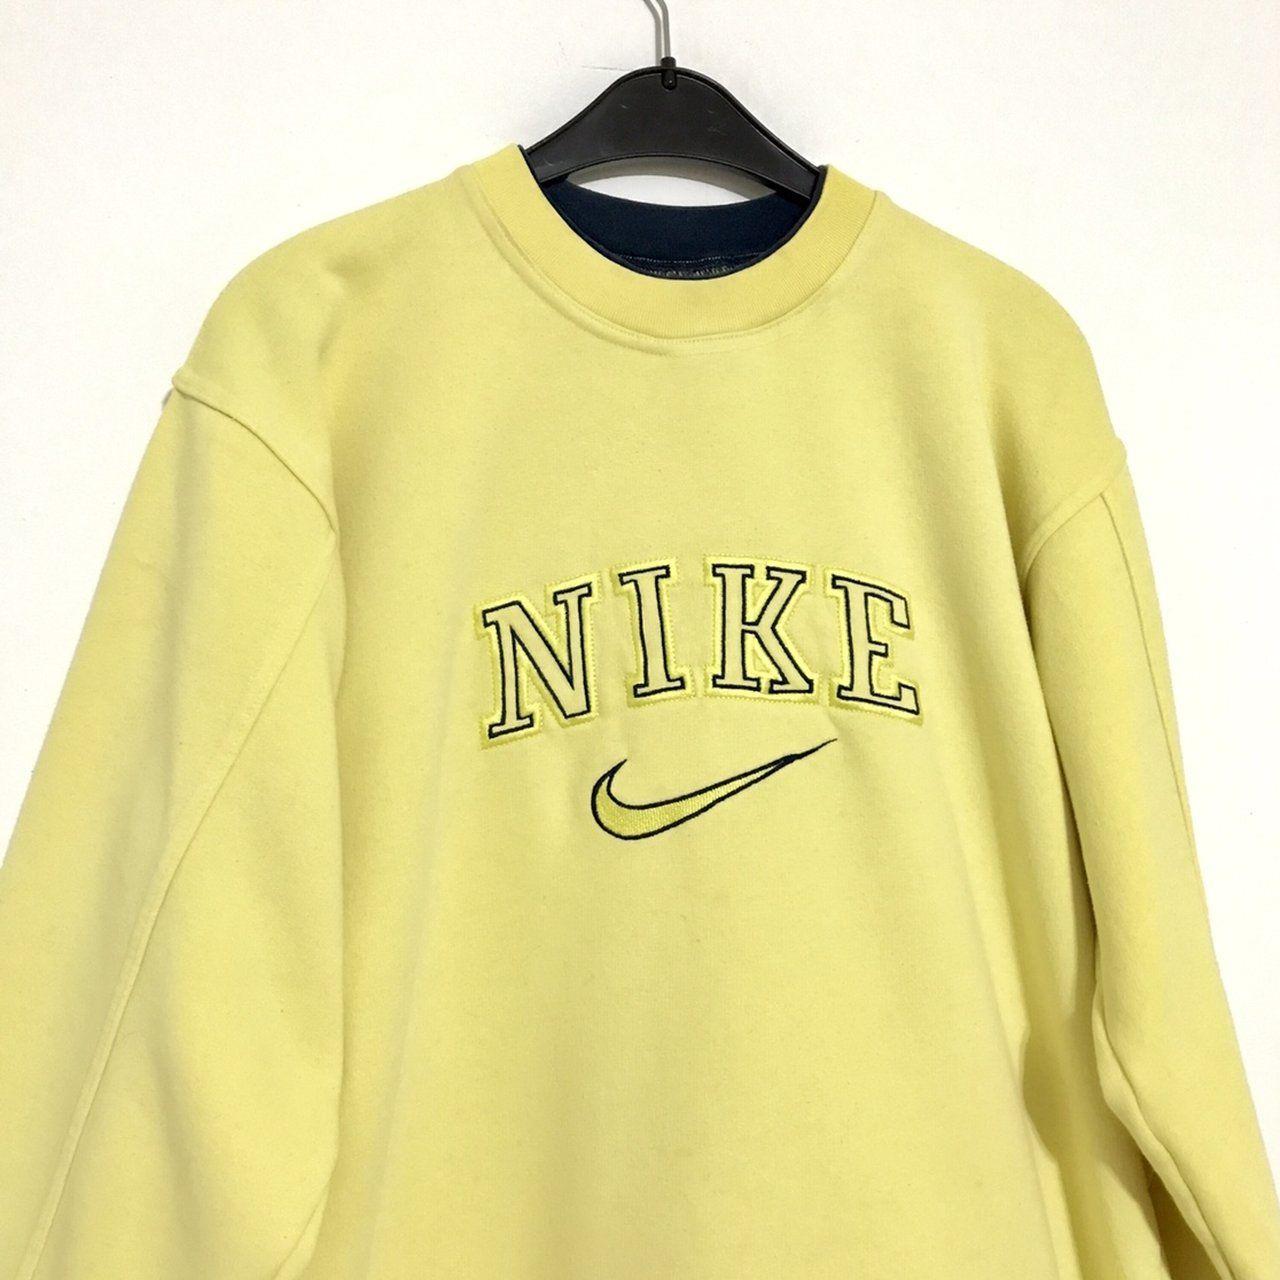 Vintage Nike sweatshirt Size M womens Good condition... - Depop